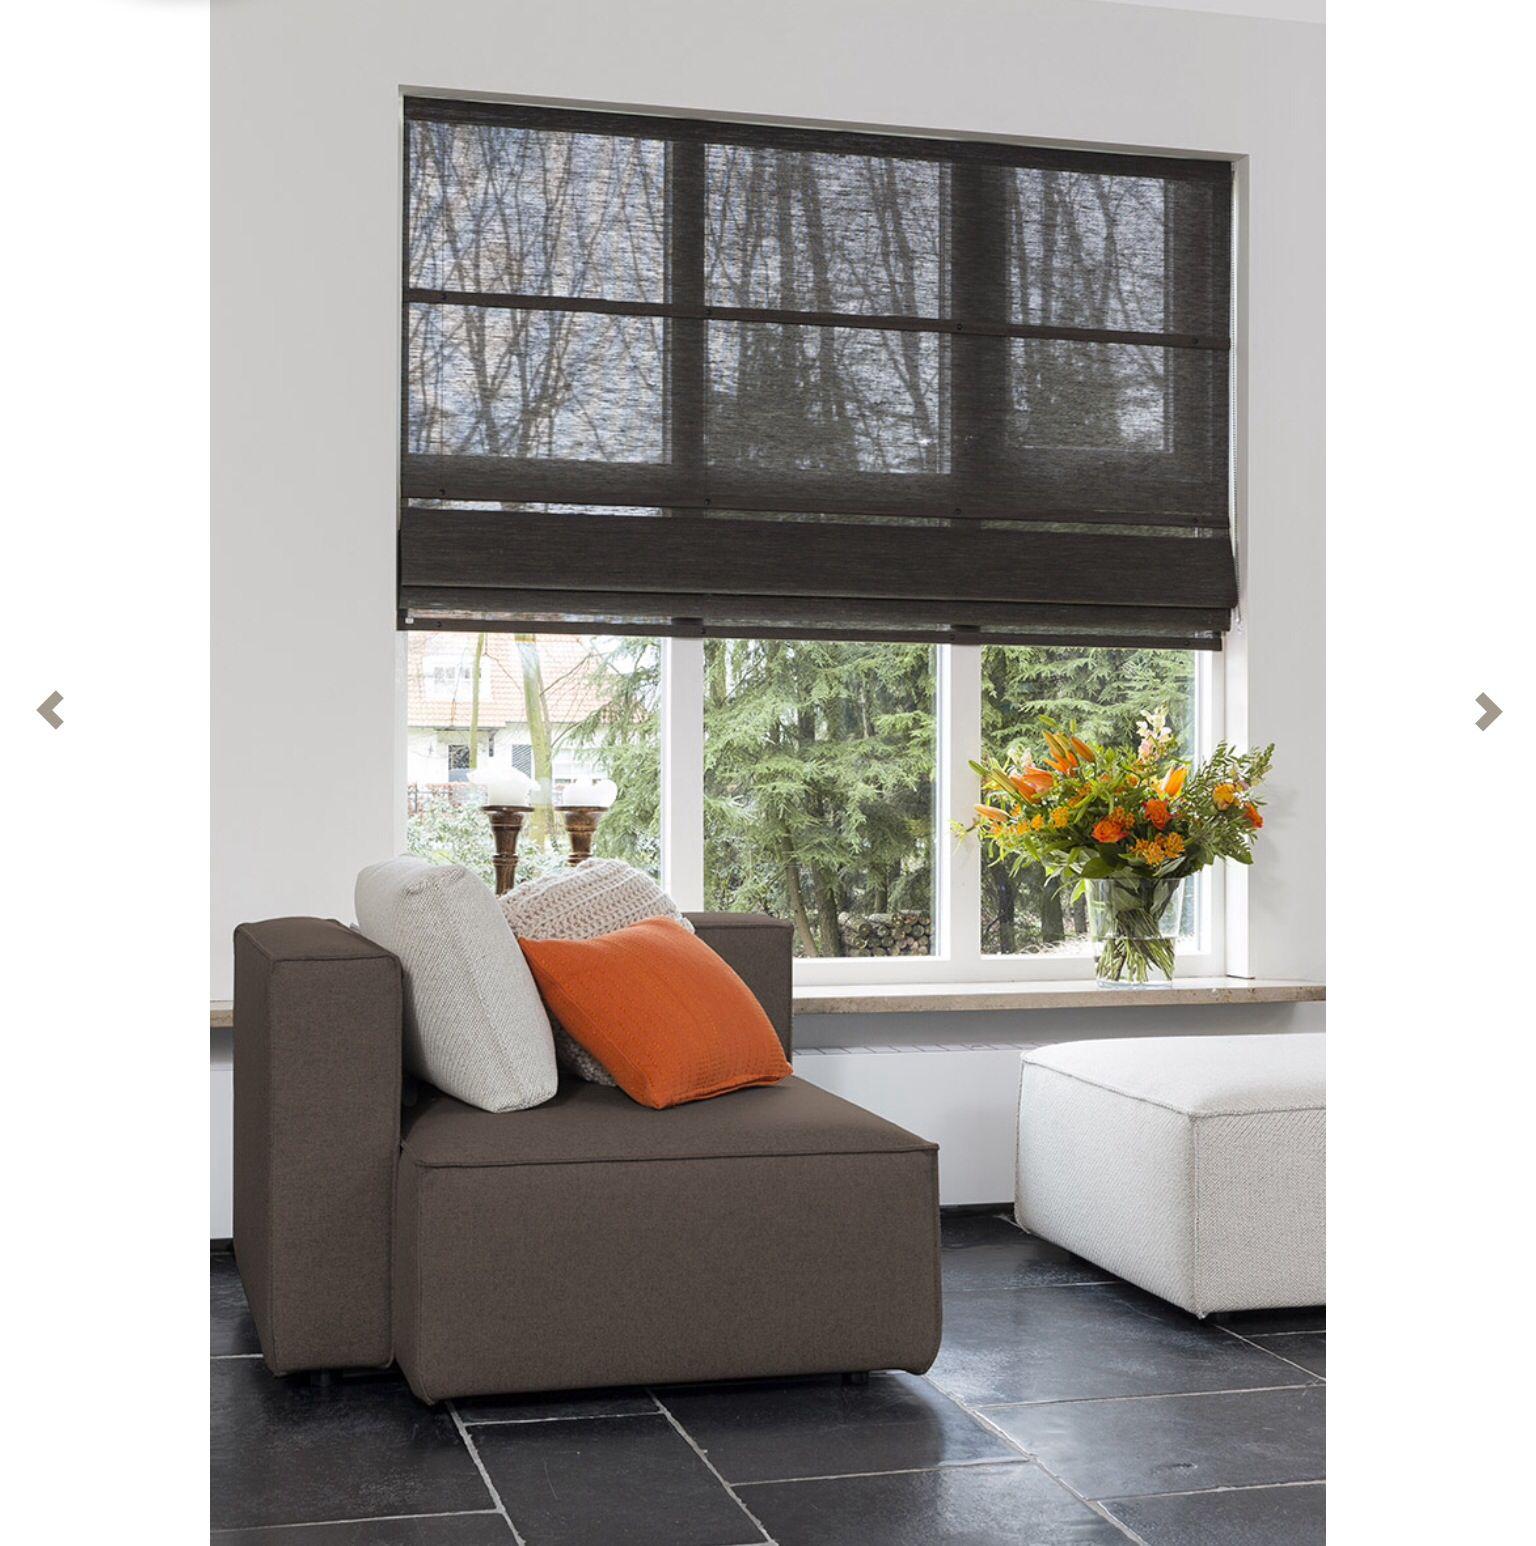 Sheer Roman Shade Dark Color Window Shades Matching Dark Tile Flooring Living Room Window Treatments Home Window Treatments Living Room Curtains Living Room #roman #shades #for #living #room #windows